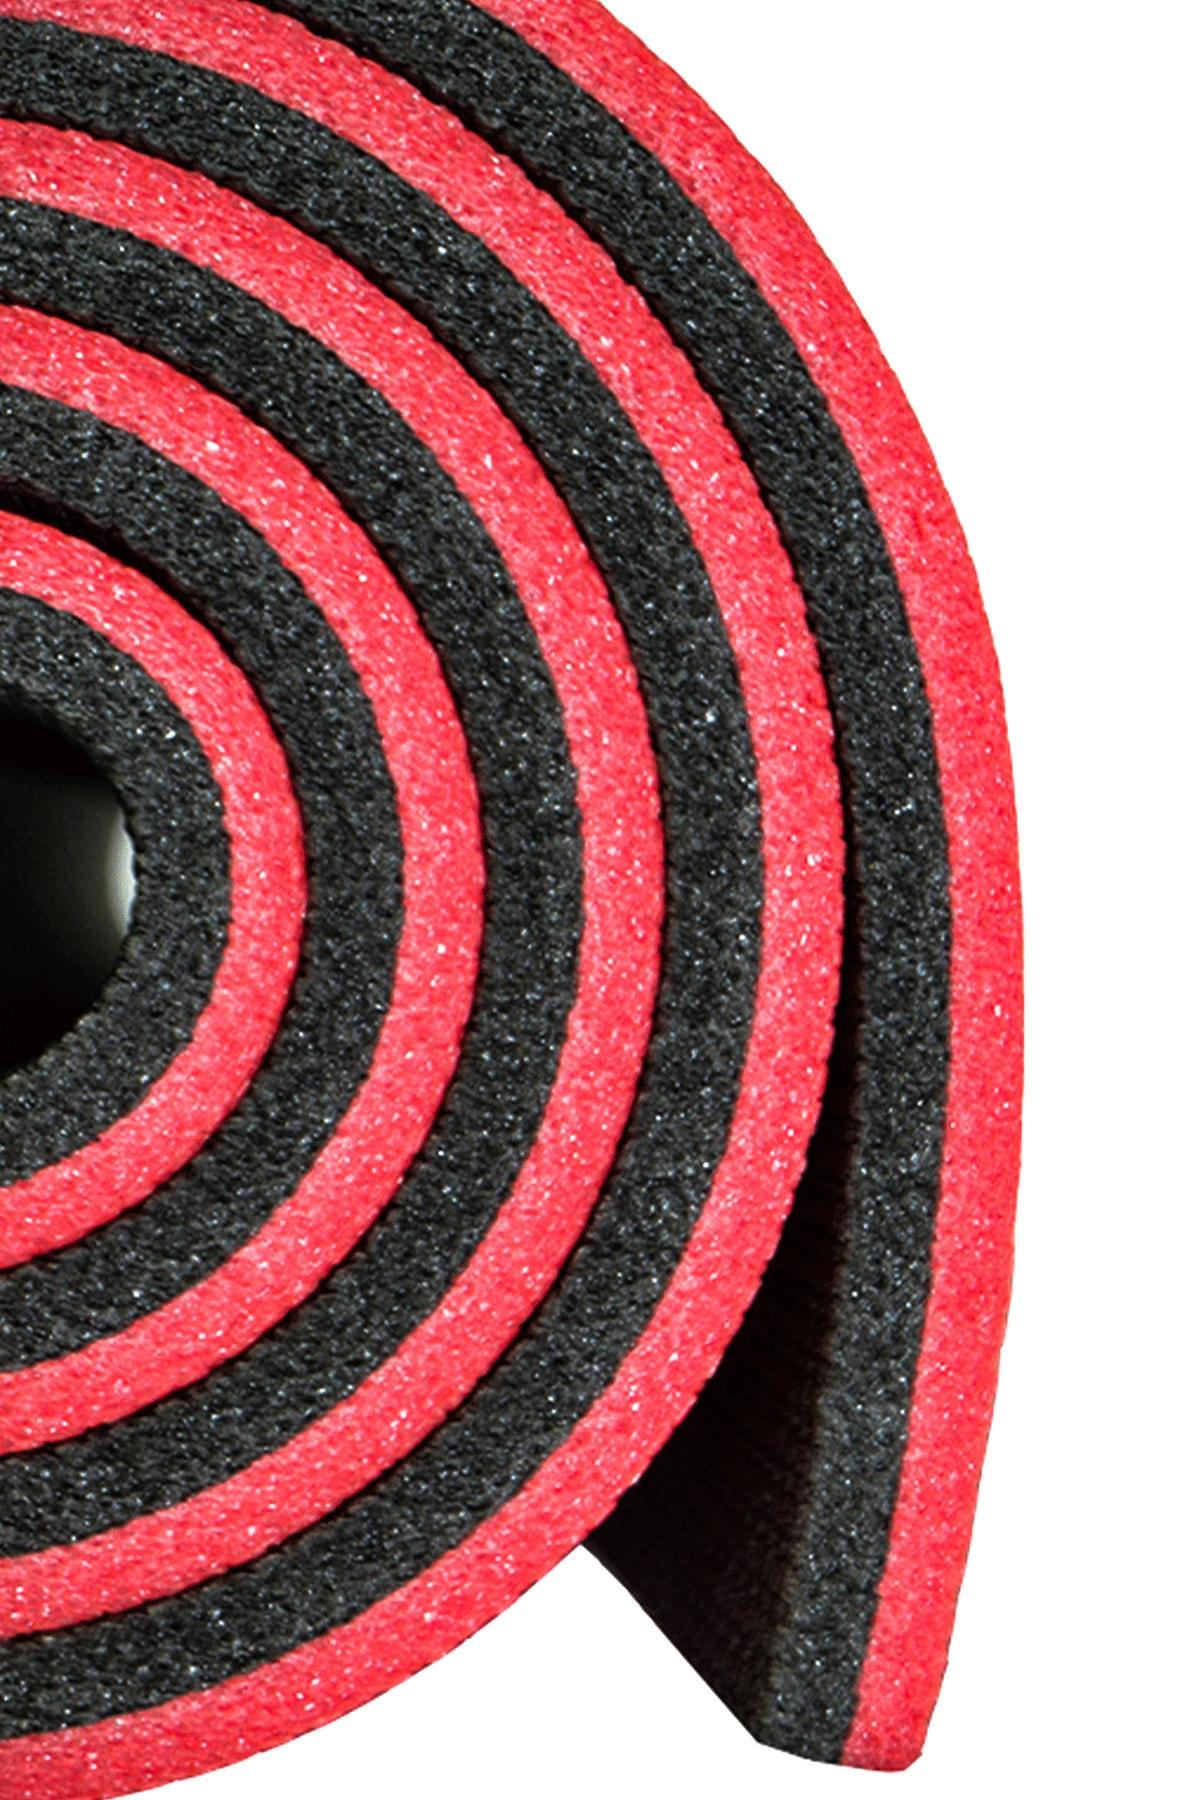 Voven Pembe Profesyonel Yoga Matı 10 Mm Pilates Minderi Pembe 2